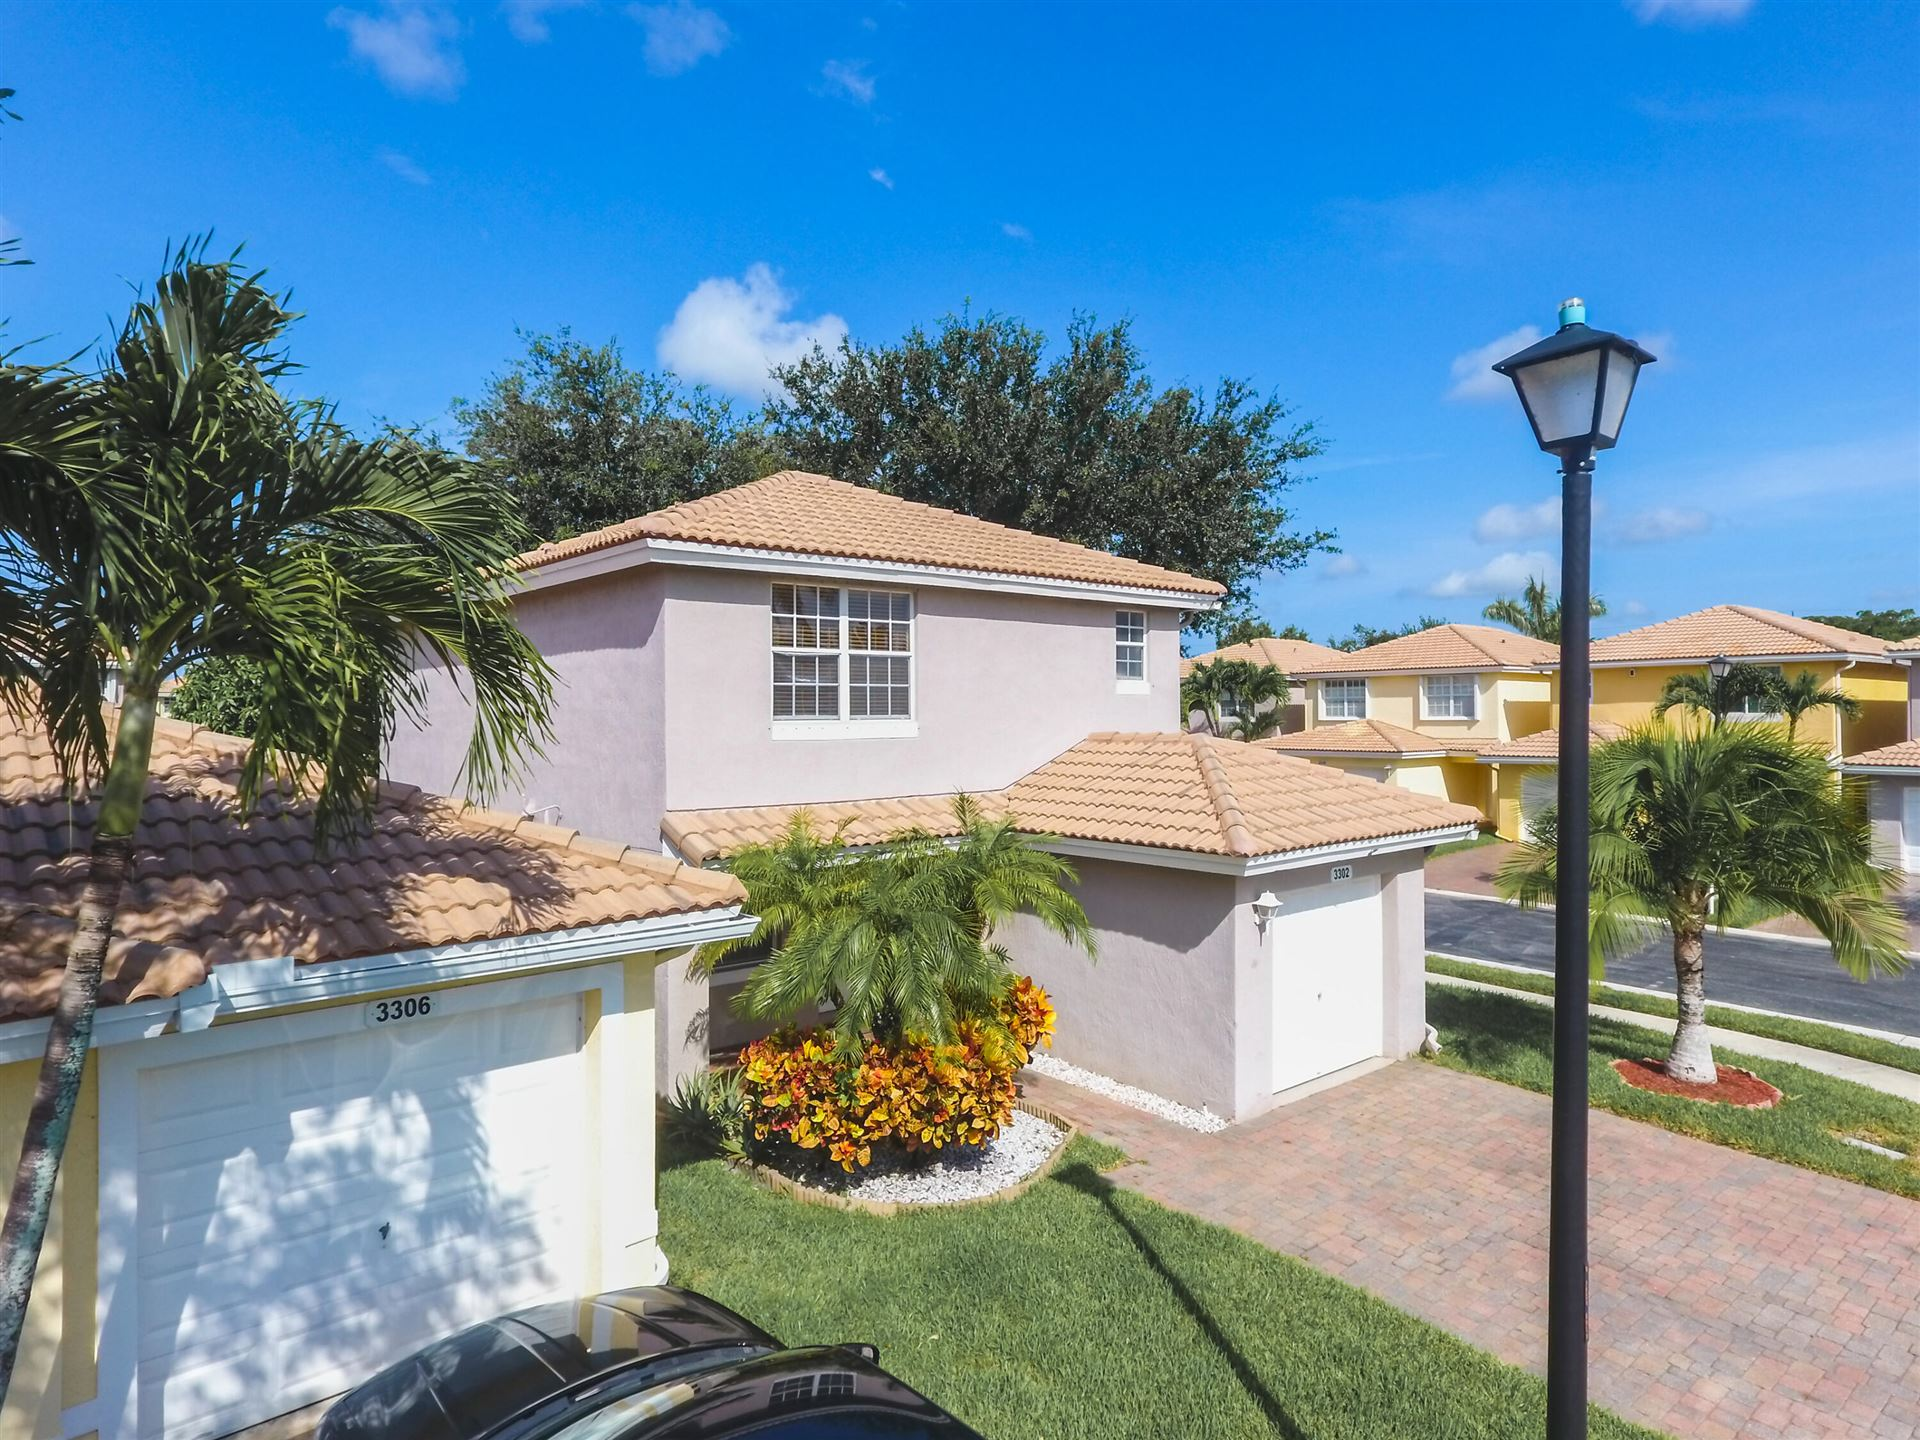 3302 Blue Finn Drive, West Palm Beach, FL 33411 - MLS#: RX-10735124